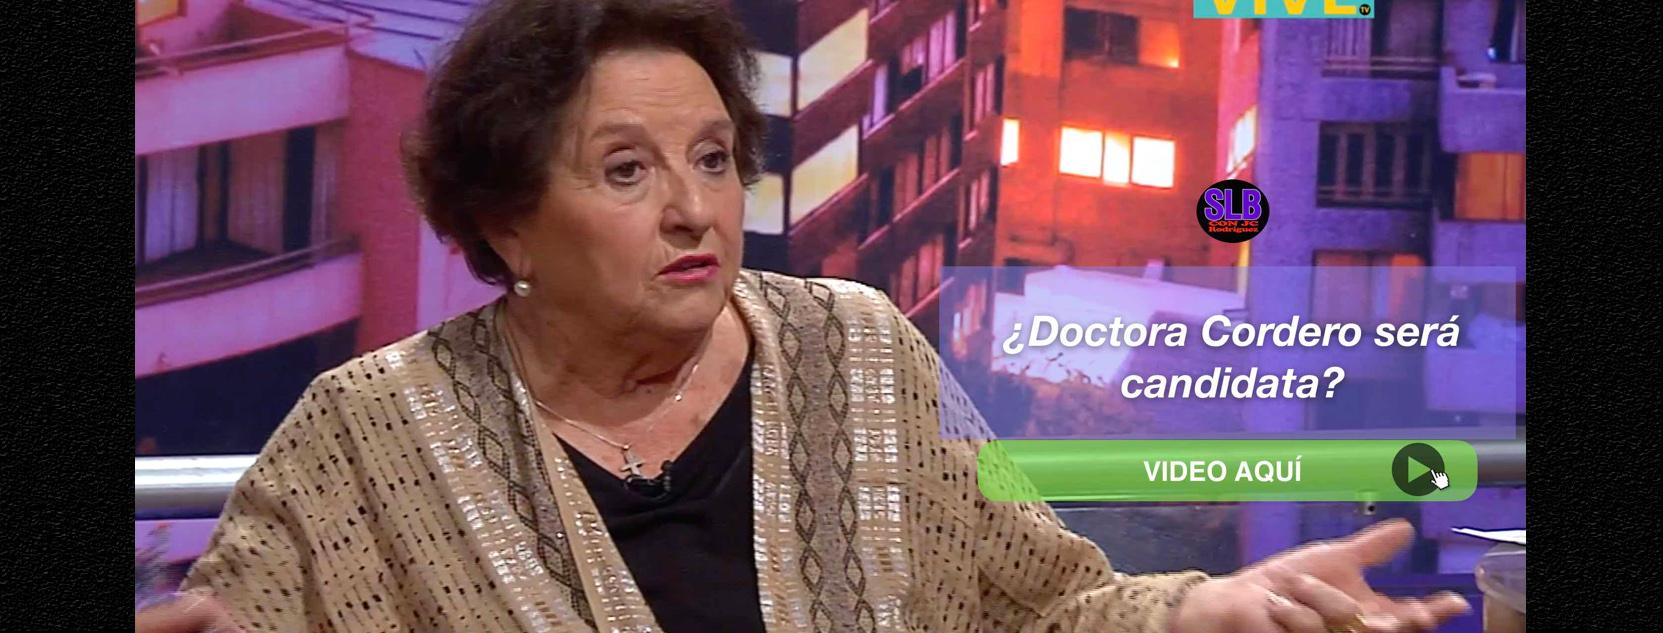 doctora-cordero-candidata